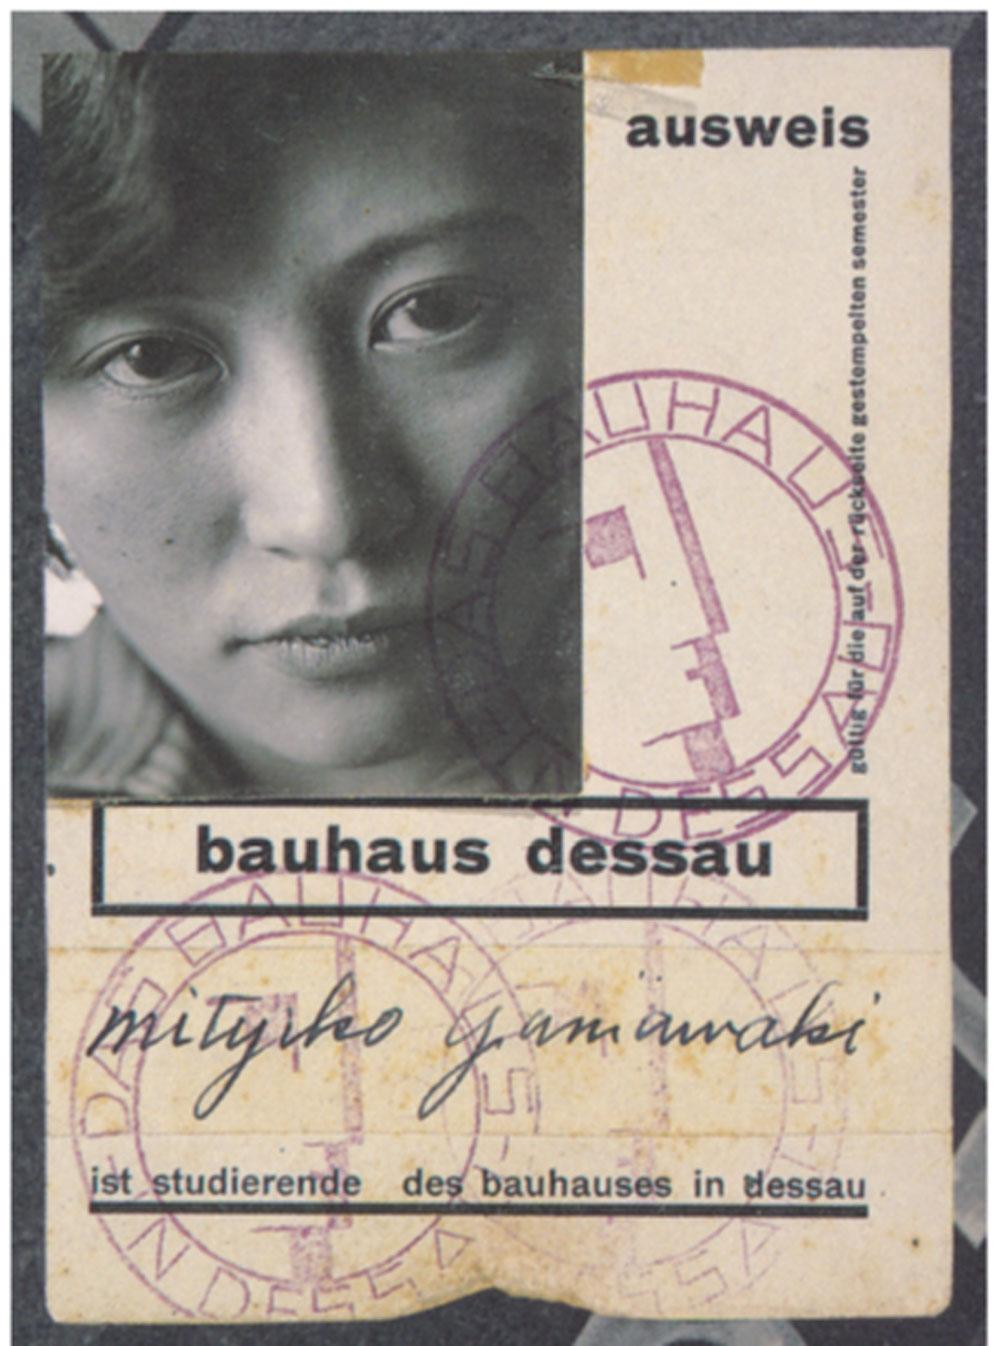 frauen-am-bauhaus-buchtipp-studentenausweis-von-mytyiko-yamawaki-copyright-nachlass-michiko-yamawaki-decohome.de_